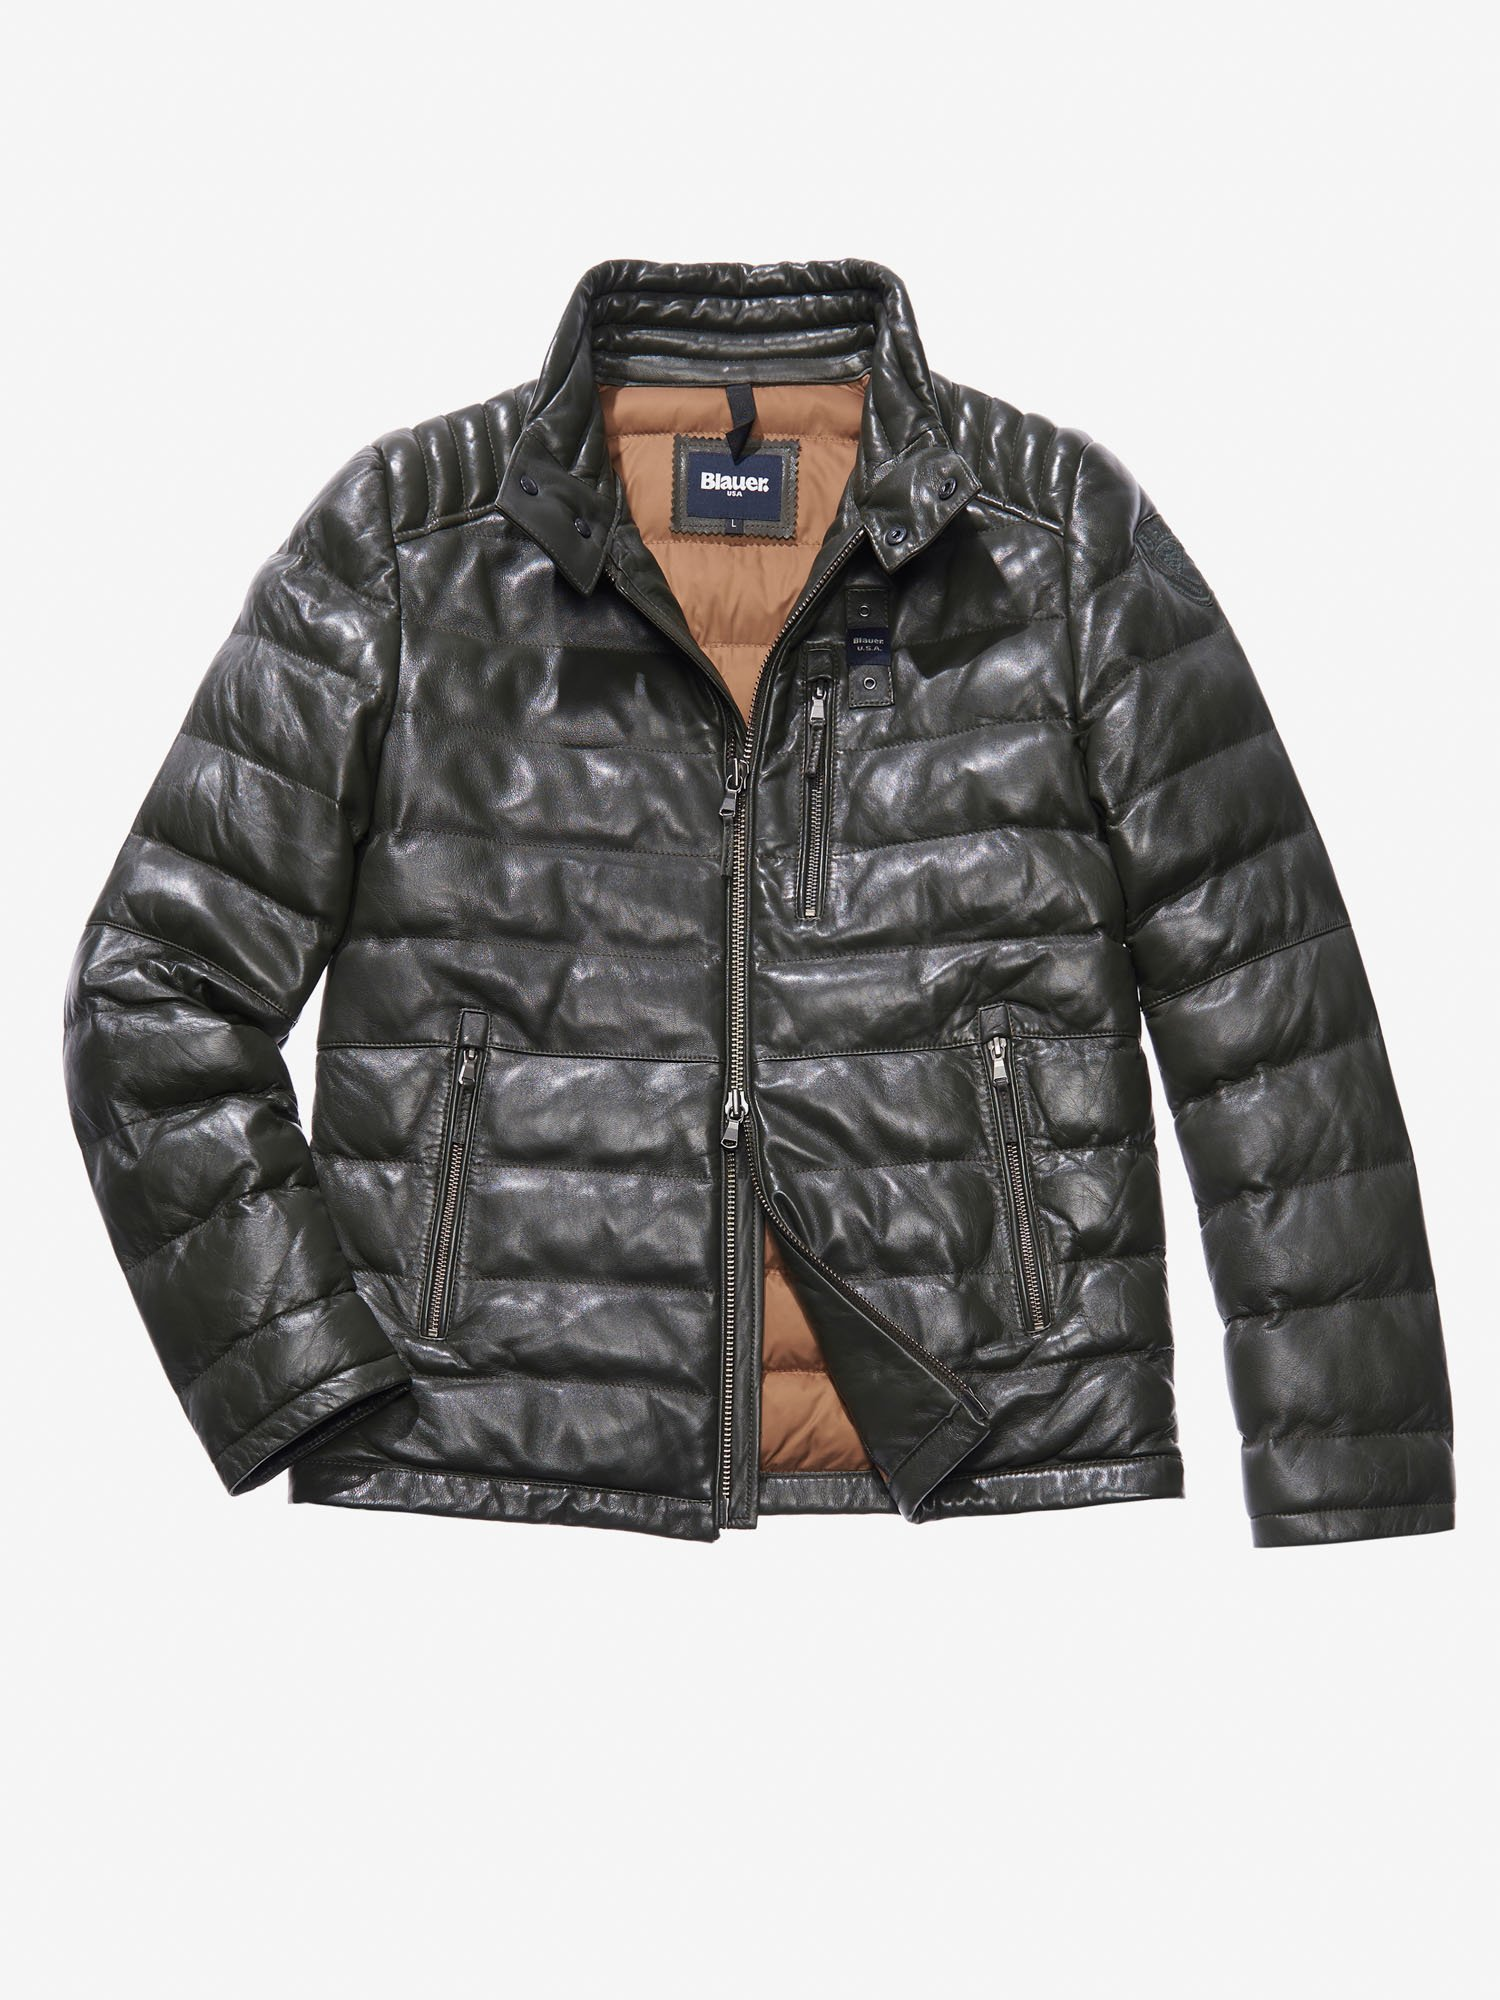 Uomo Usa E Giacche Q7tcn Pelle Giubbotti ® Blauer Di Online Shop 8n0OywNvm